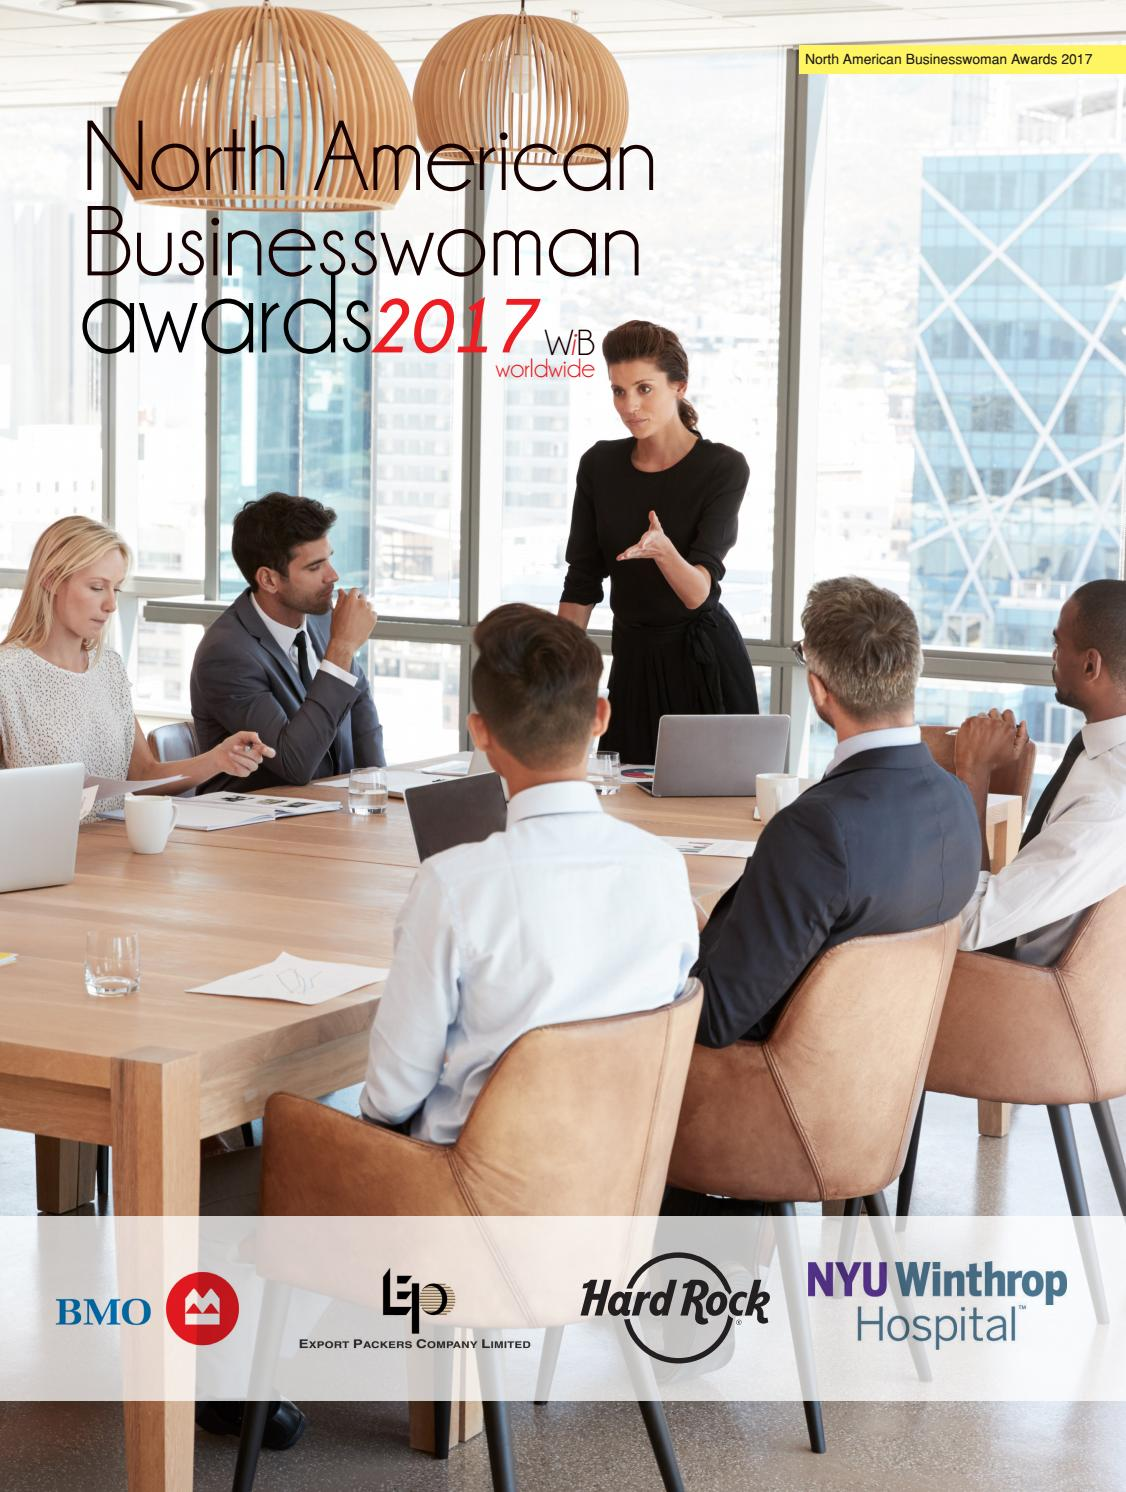 WIB North American Businesswoman Awards 2017 by AI Global Media - issuu